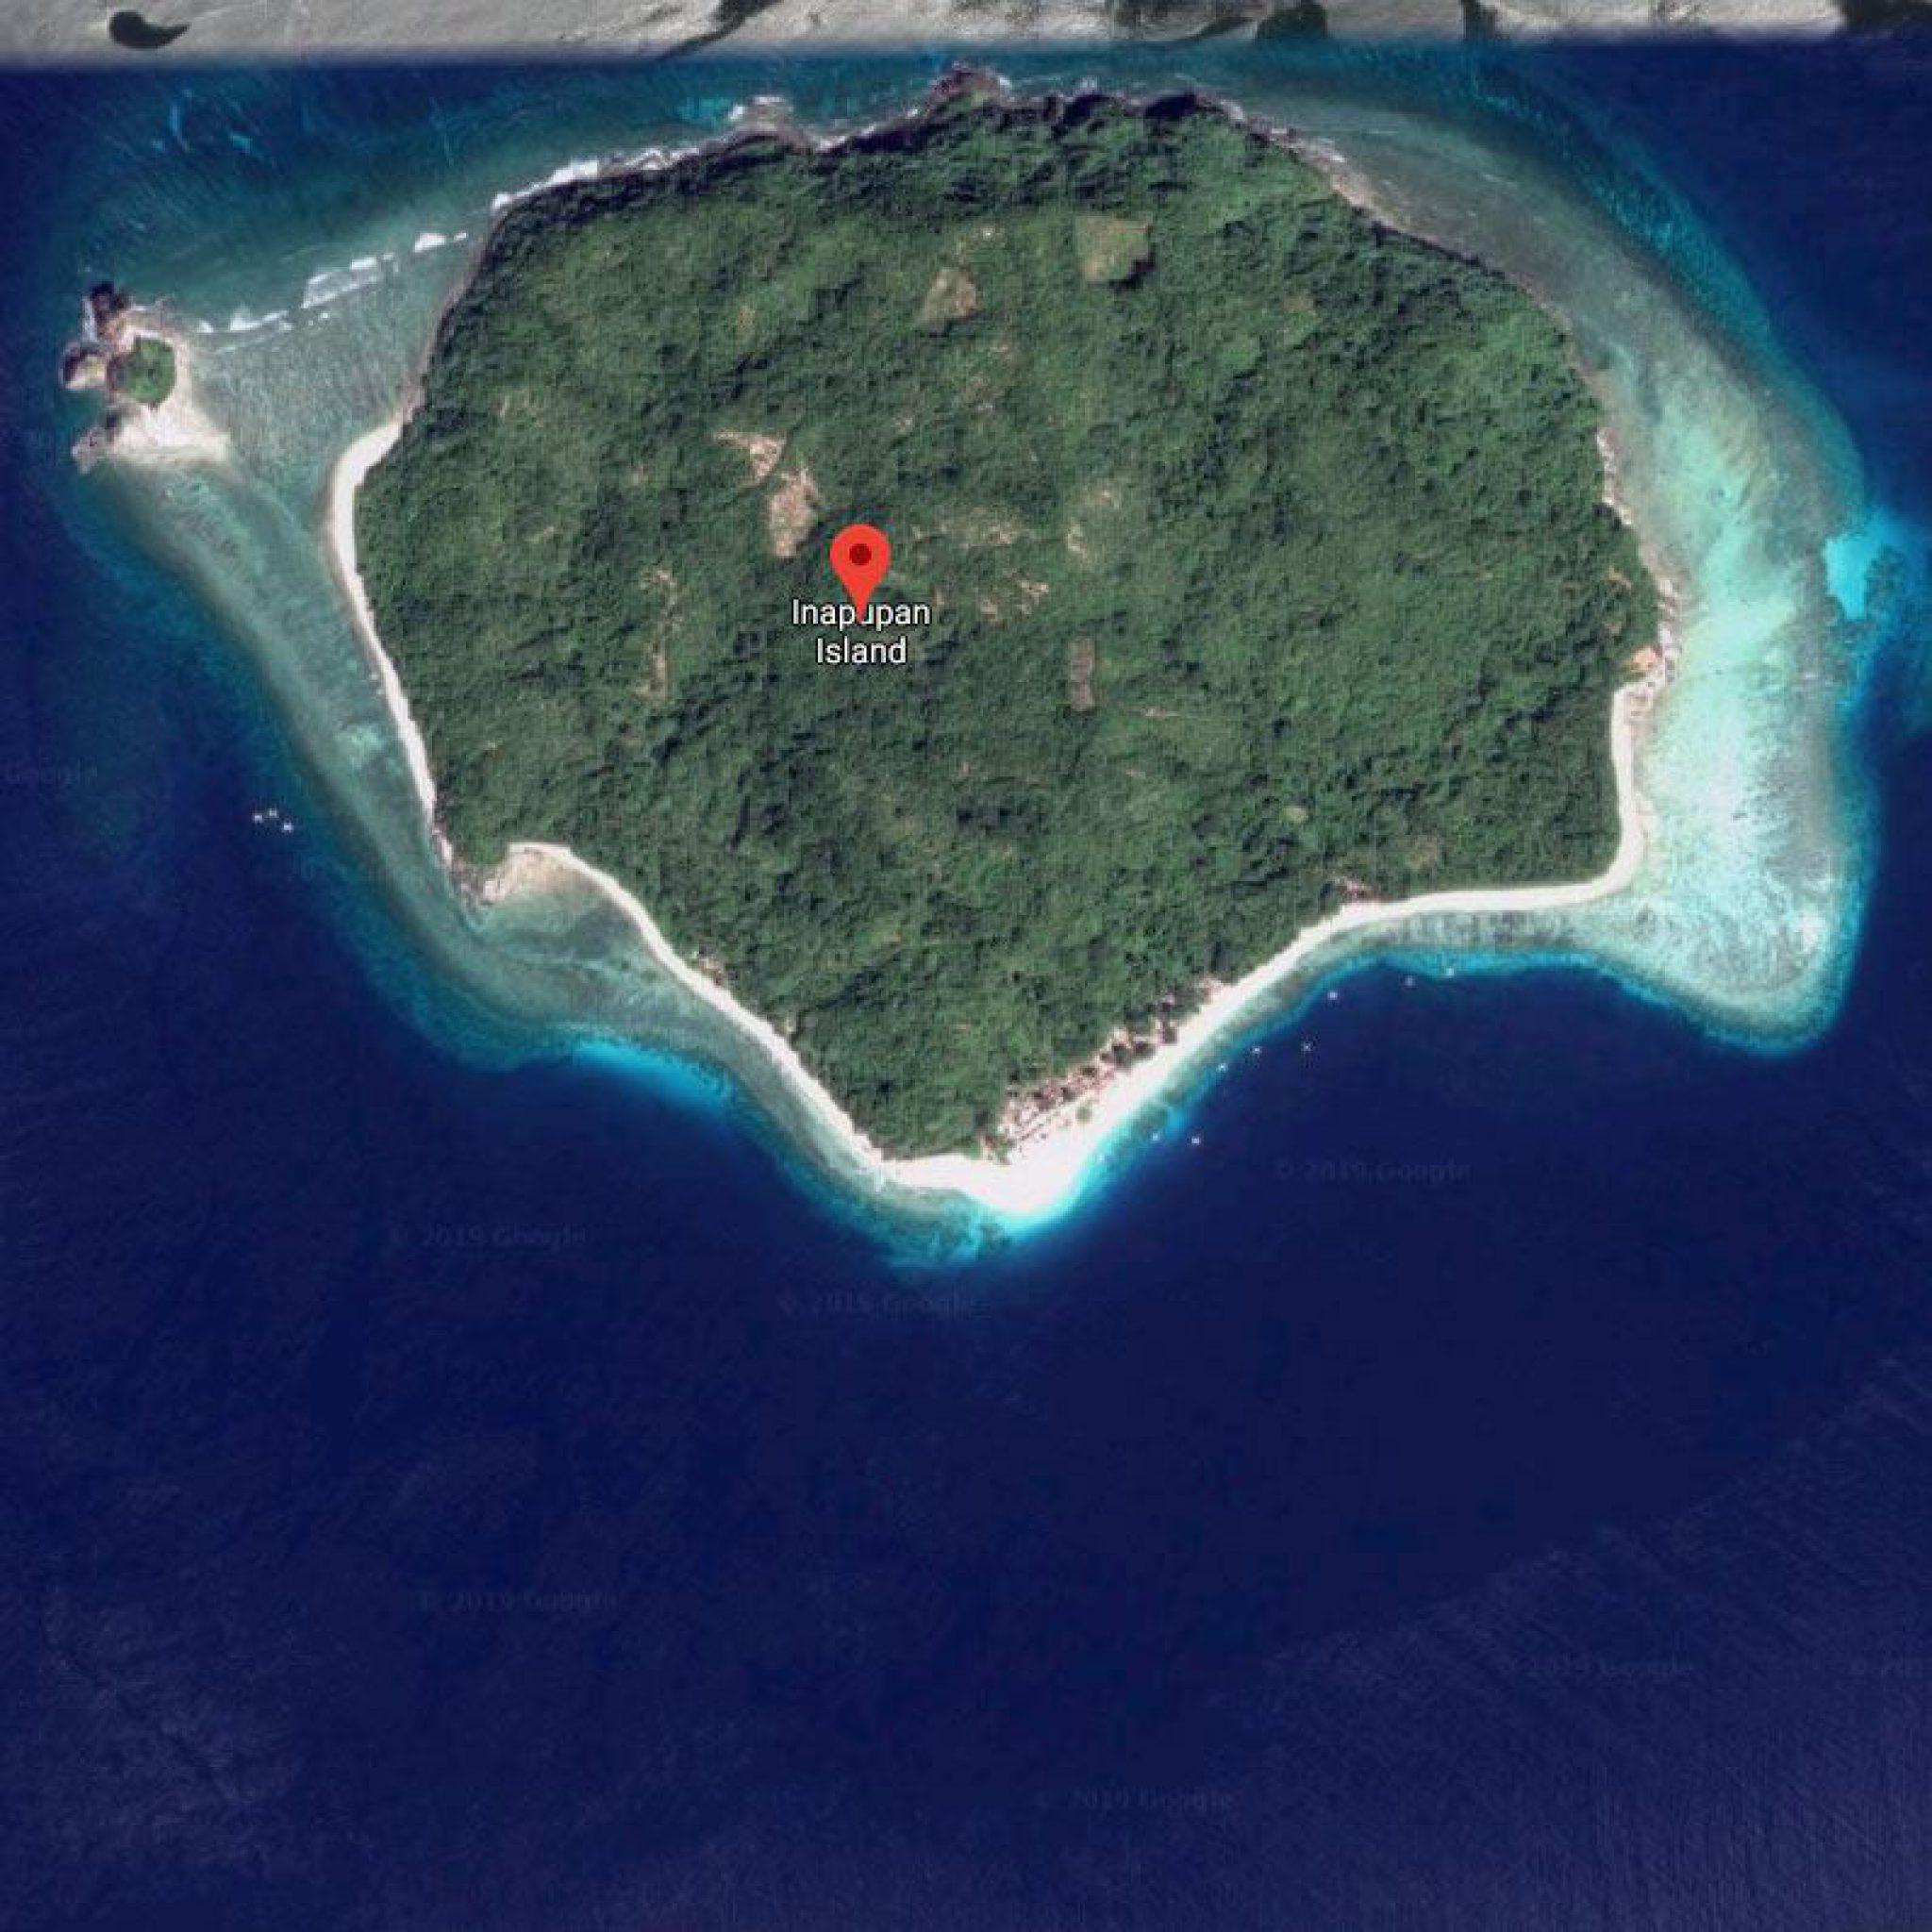 Inapupan Island